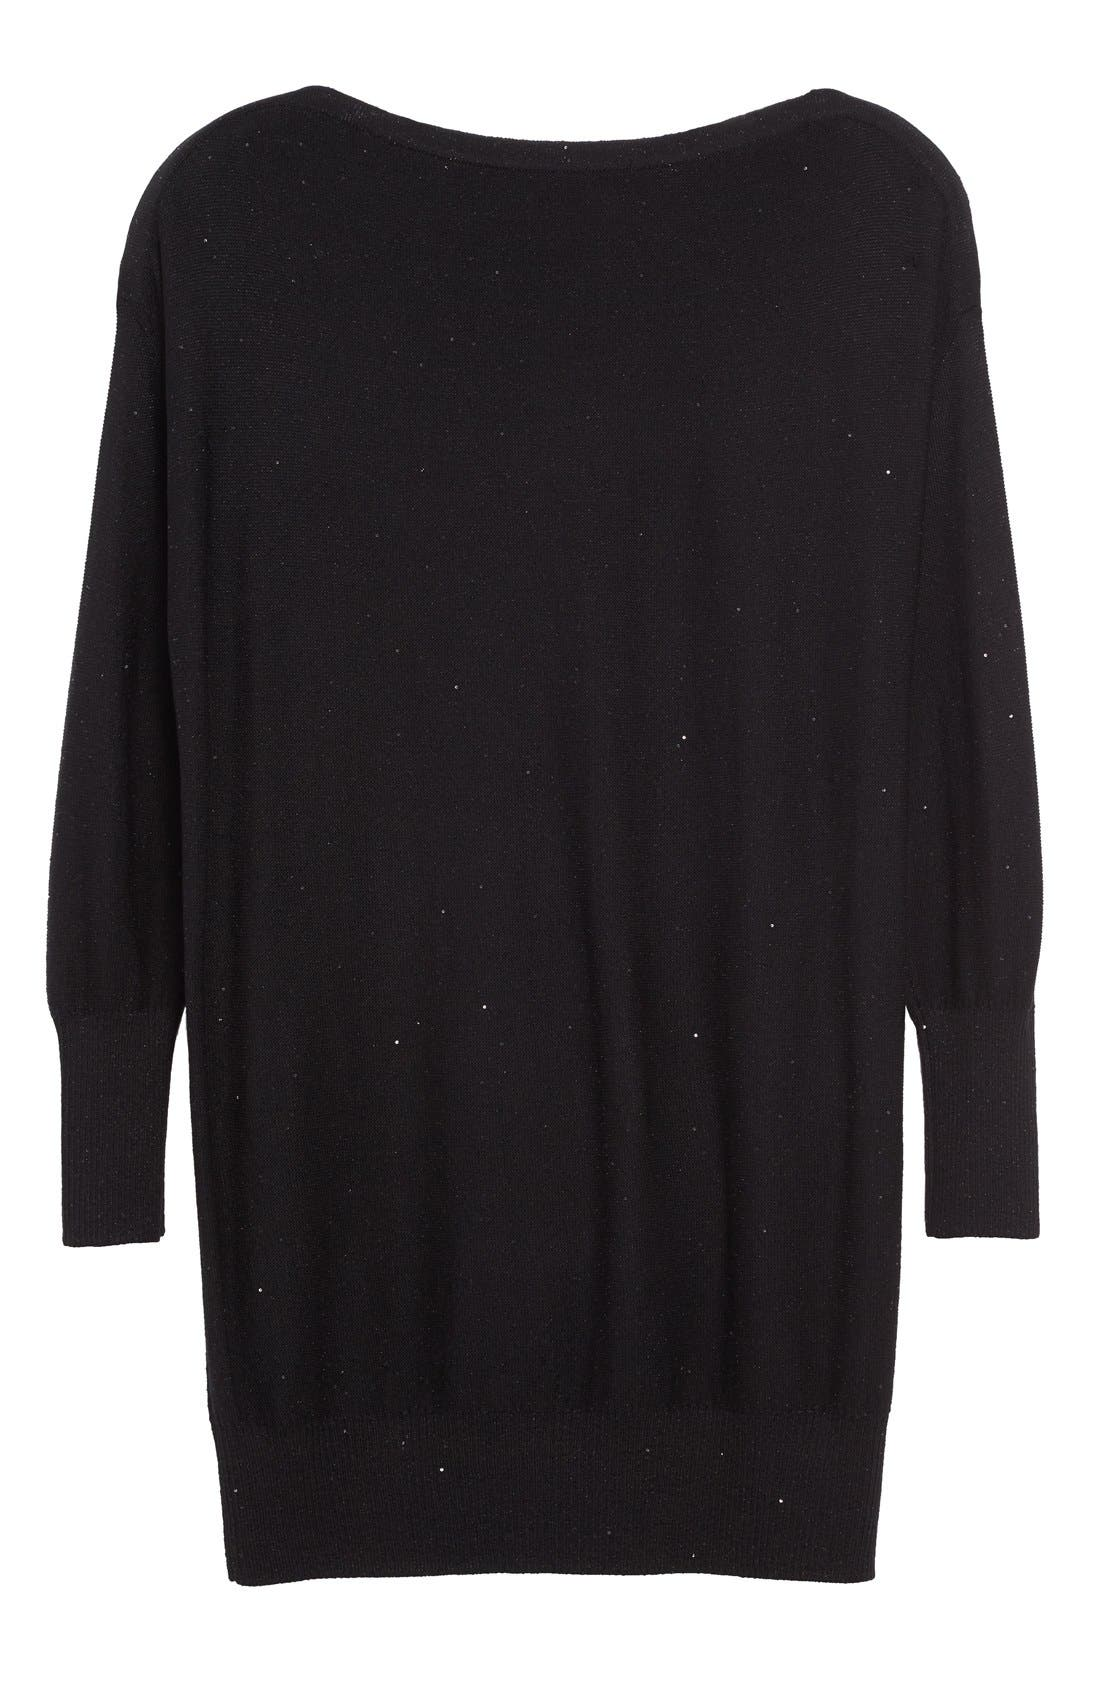 Sequin Knit Silk Blend Sweater,                             Alternate thumbnail 4, color,                             BLACK